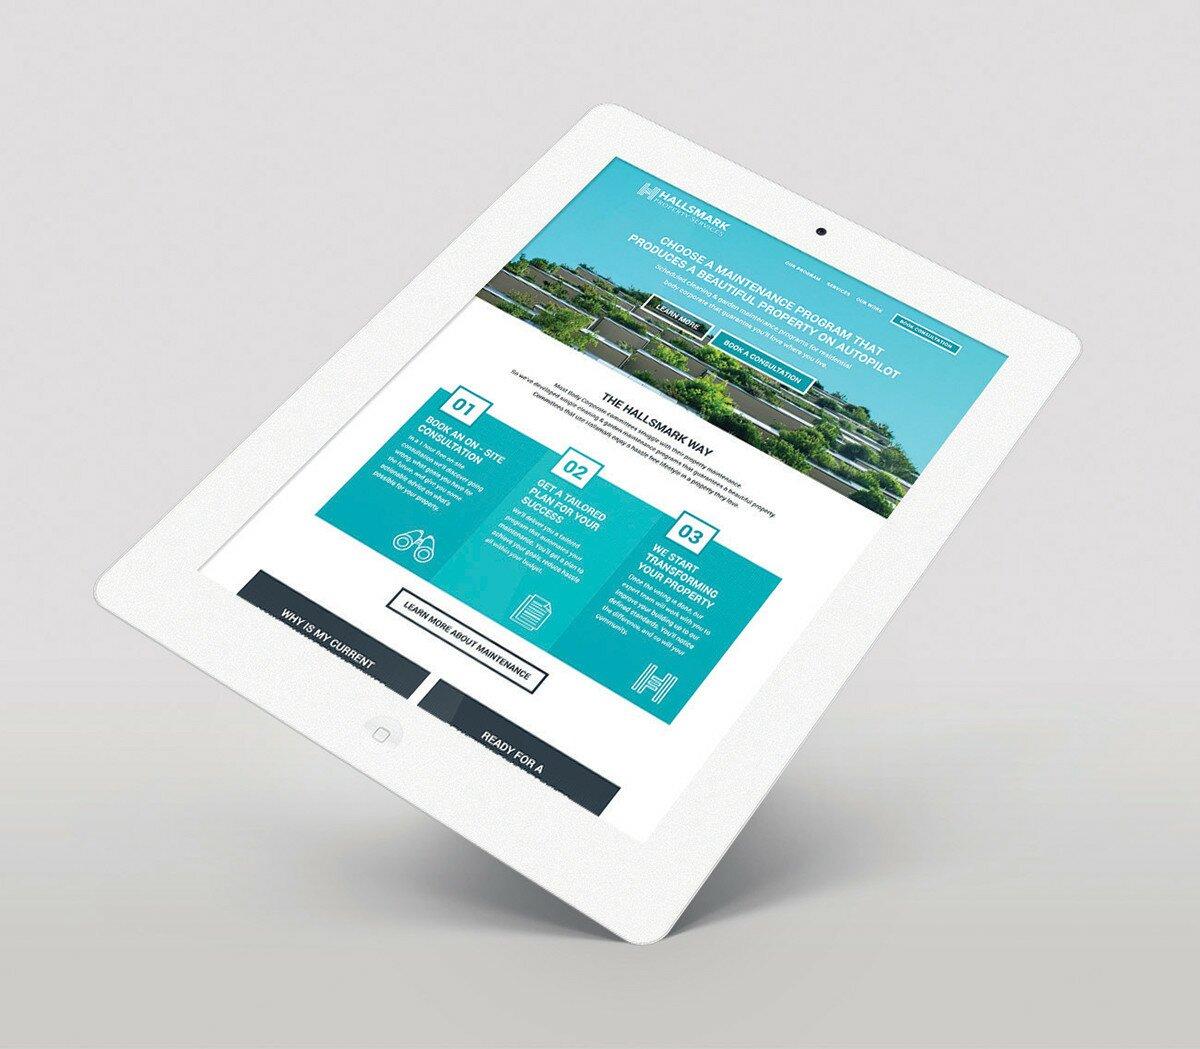 Profile Magazine Online Hallsmark2 Home Improvement